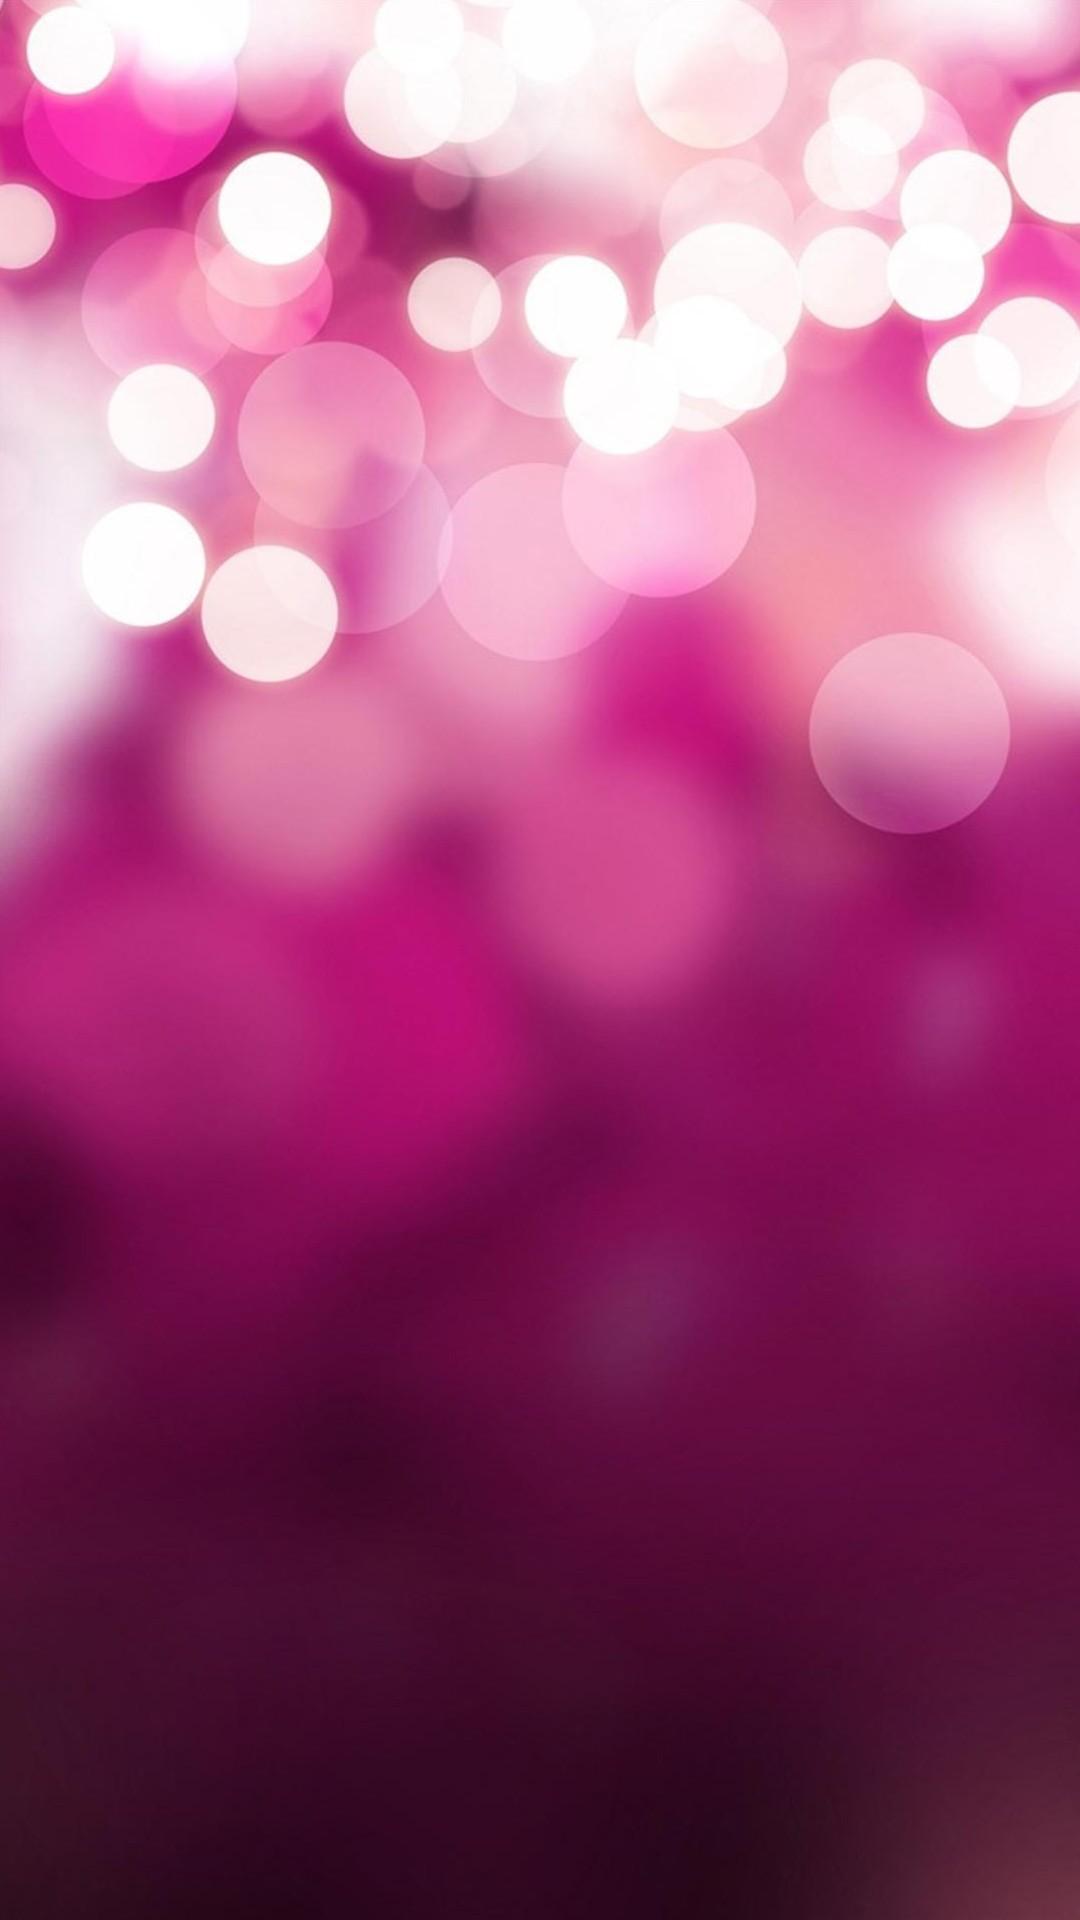 Colorful Galaxy S4 Wallpapers HD 92 Pink Galaxy Wallpaper Hd